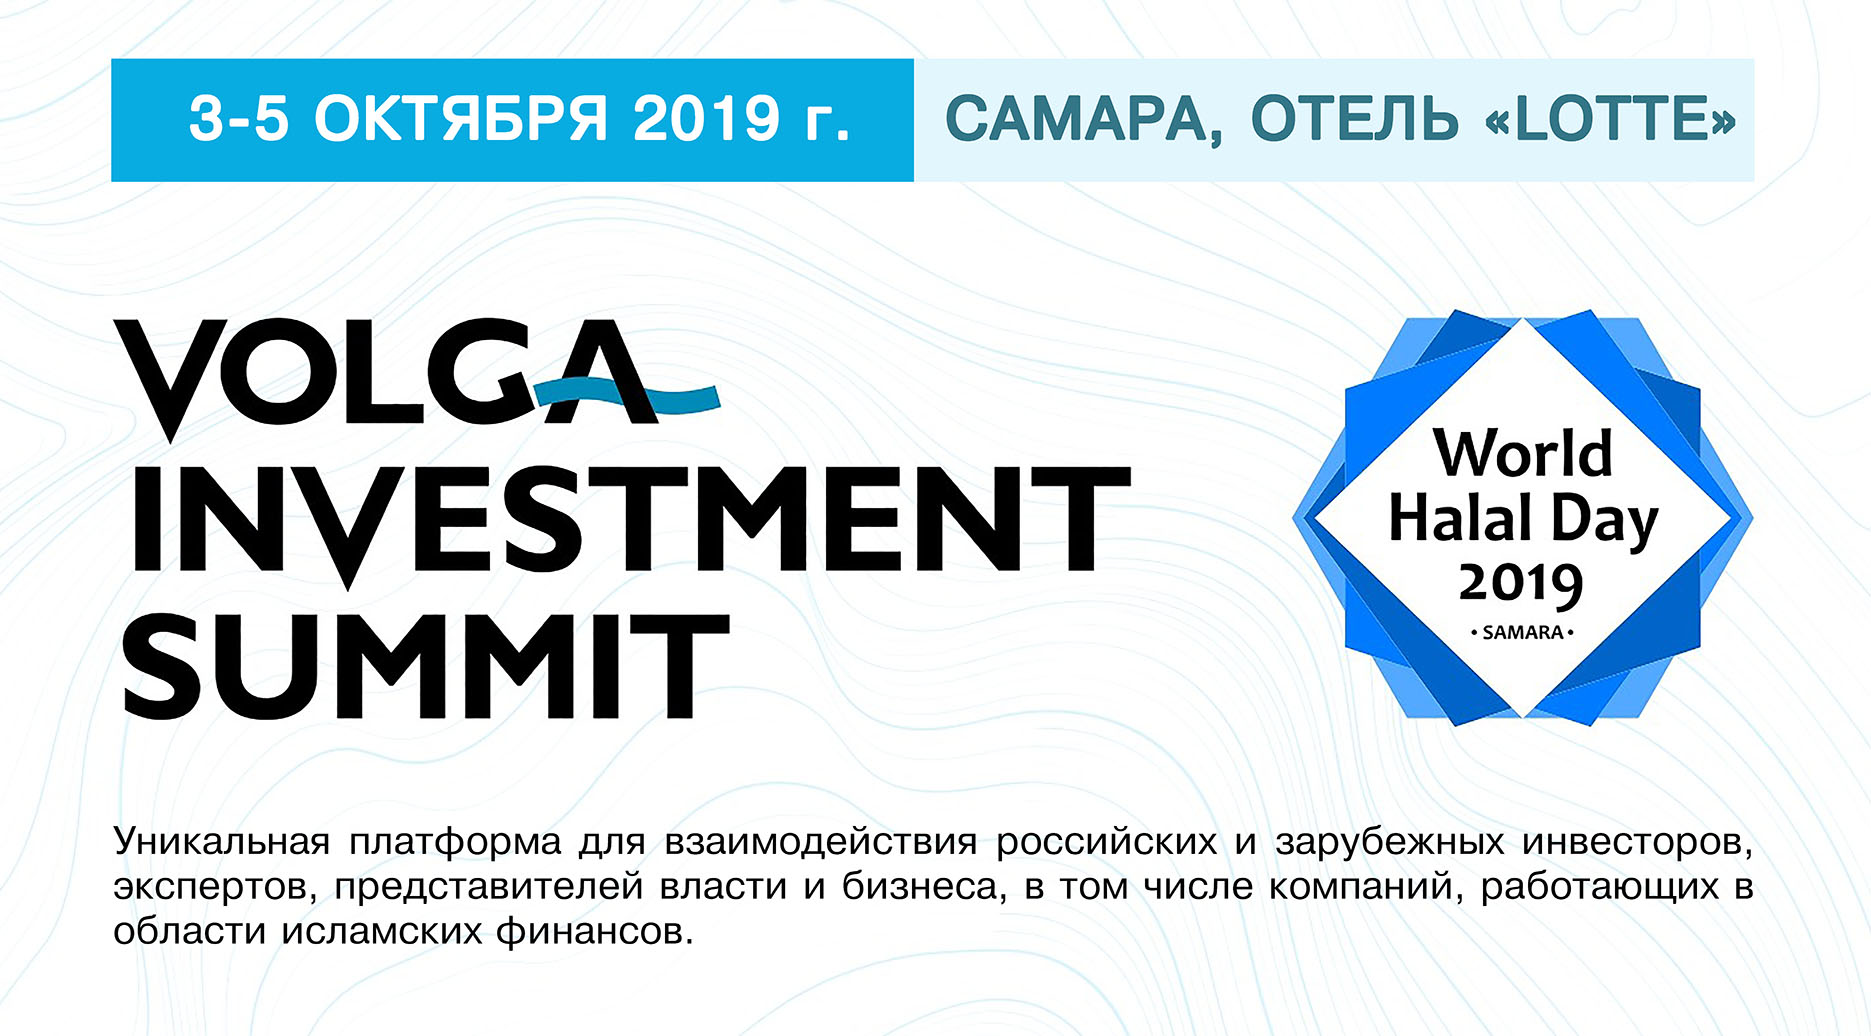 volga-investment-summit-world-halal-day